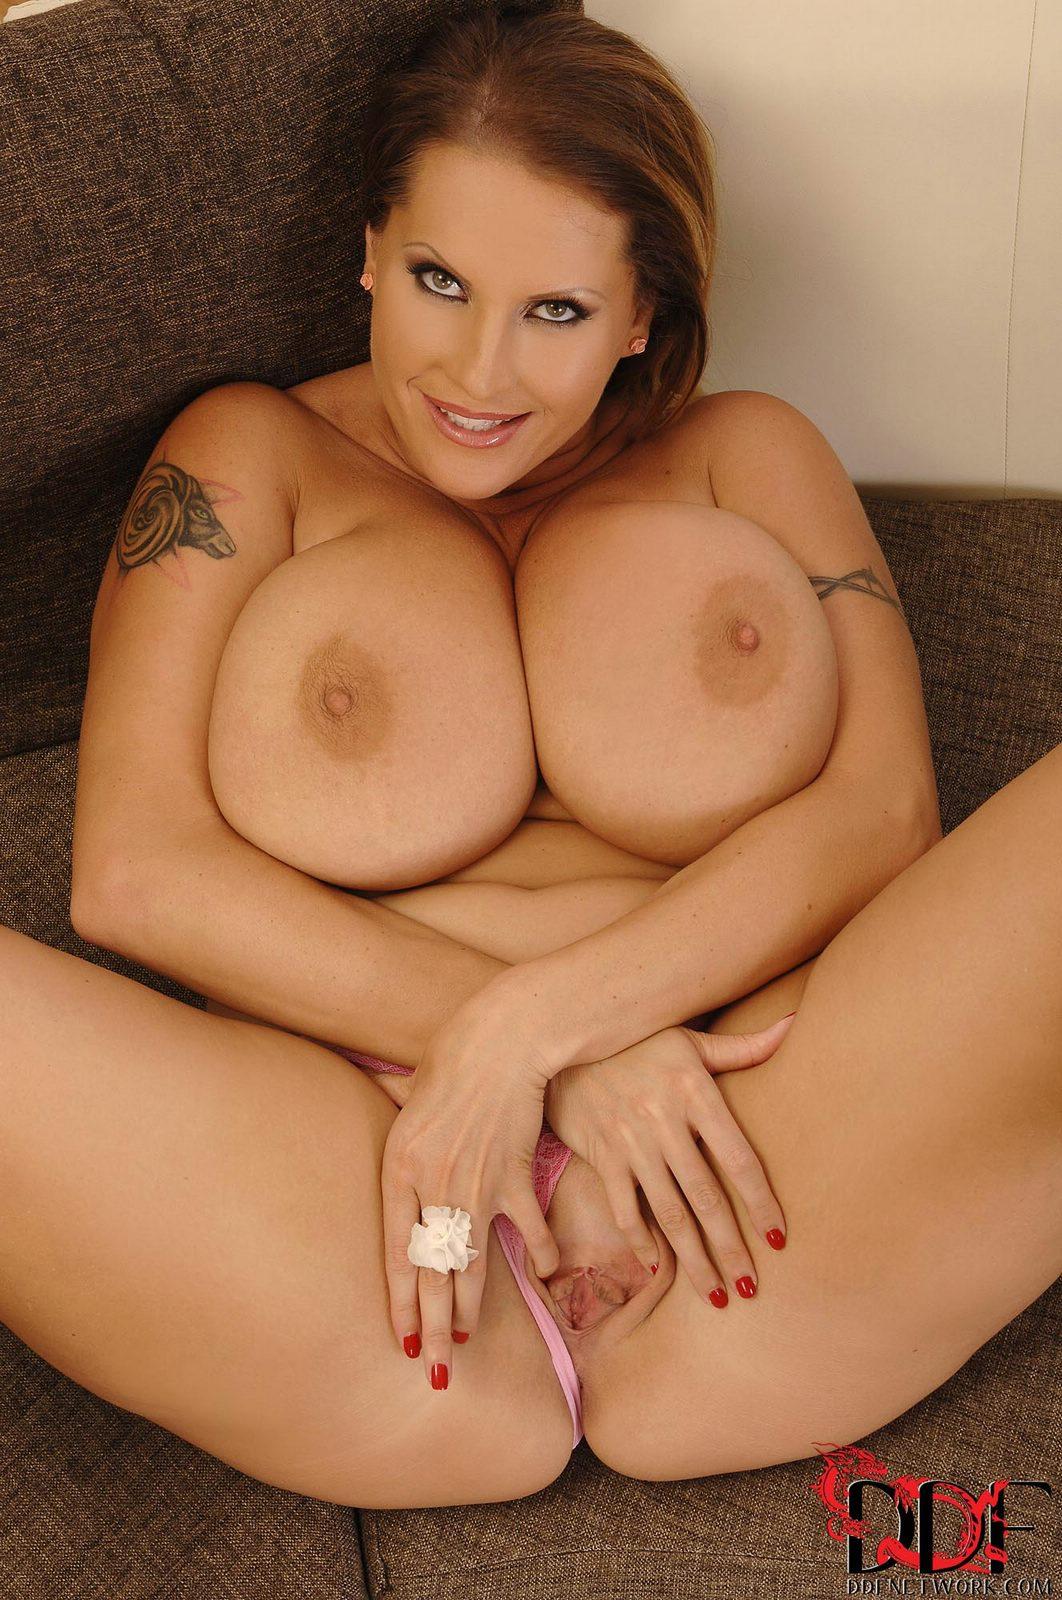 Anilos Laura Orsolya Iporn Big Tits Finger Yes Porn Pics Xxx